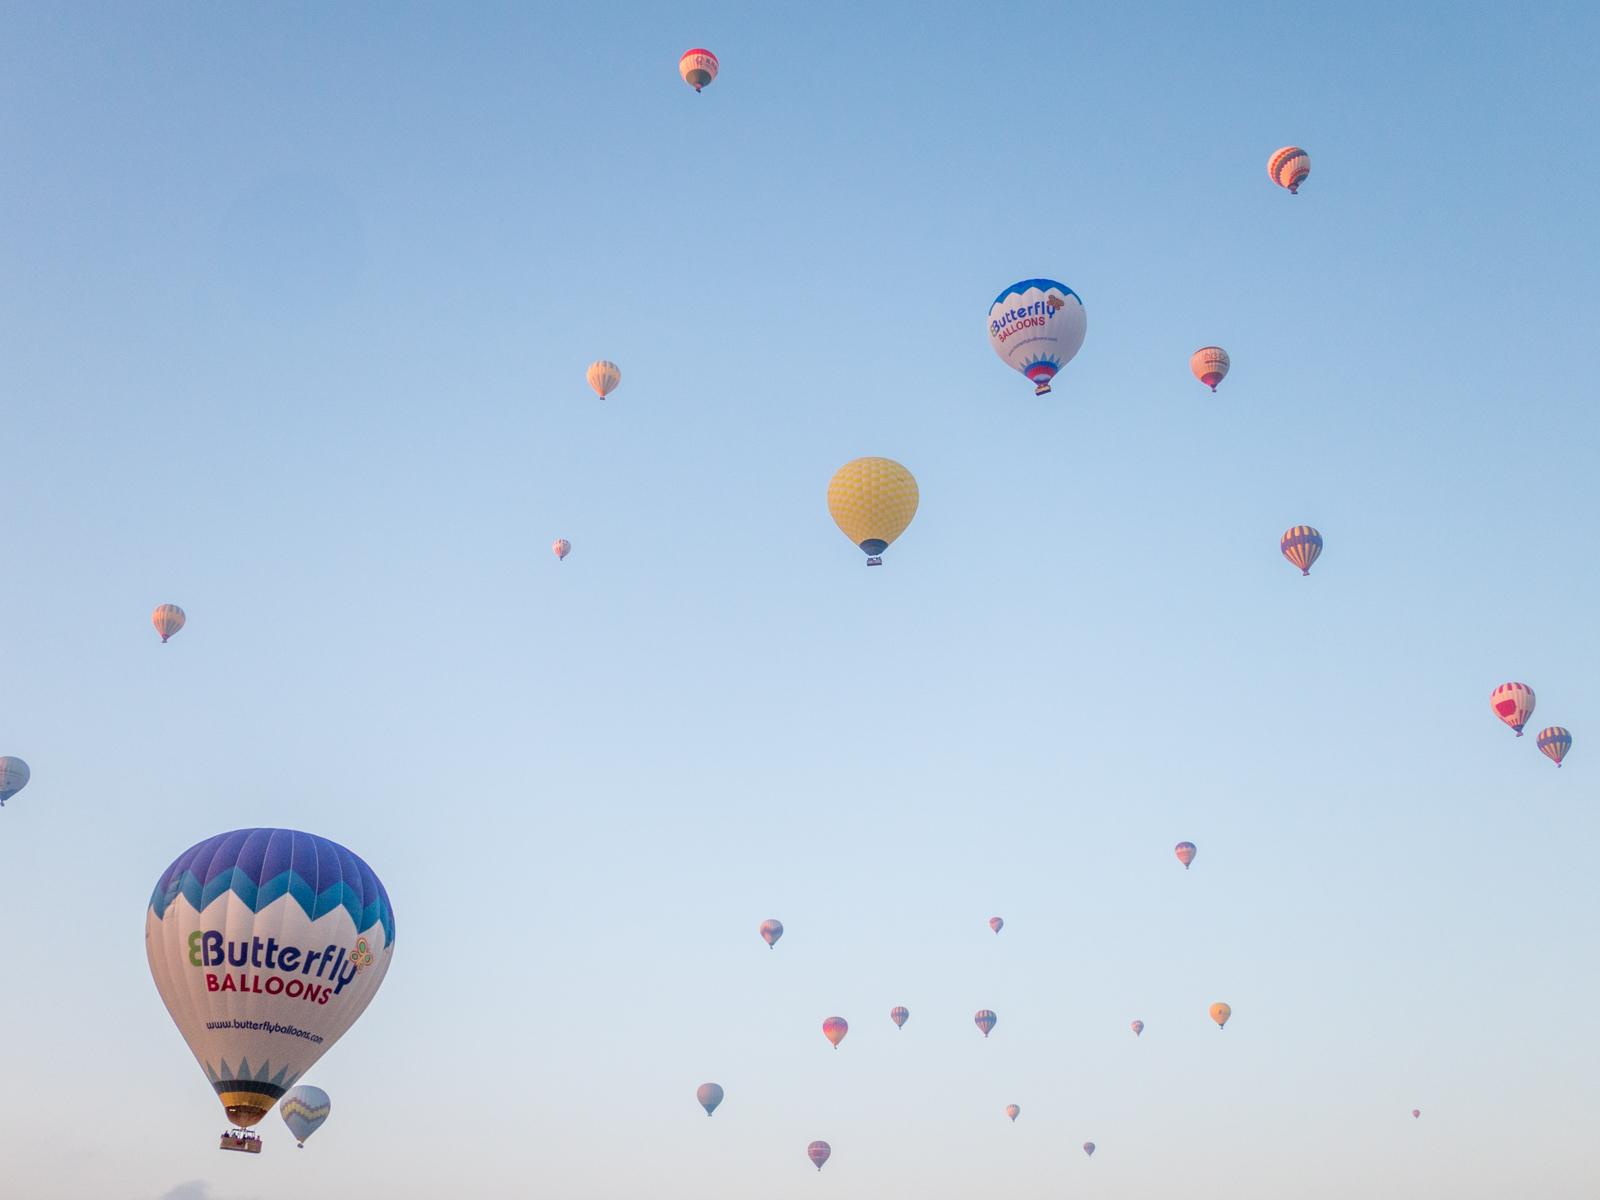 Hot air balloons fill the sky over Cappadocia, Turkey